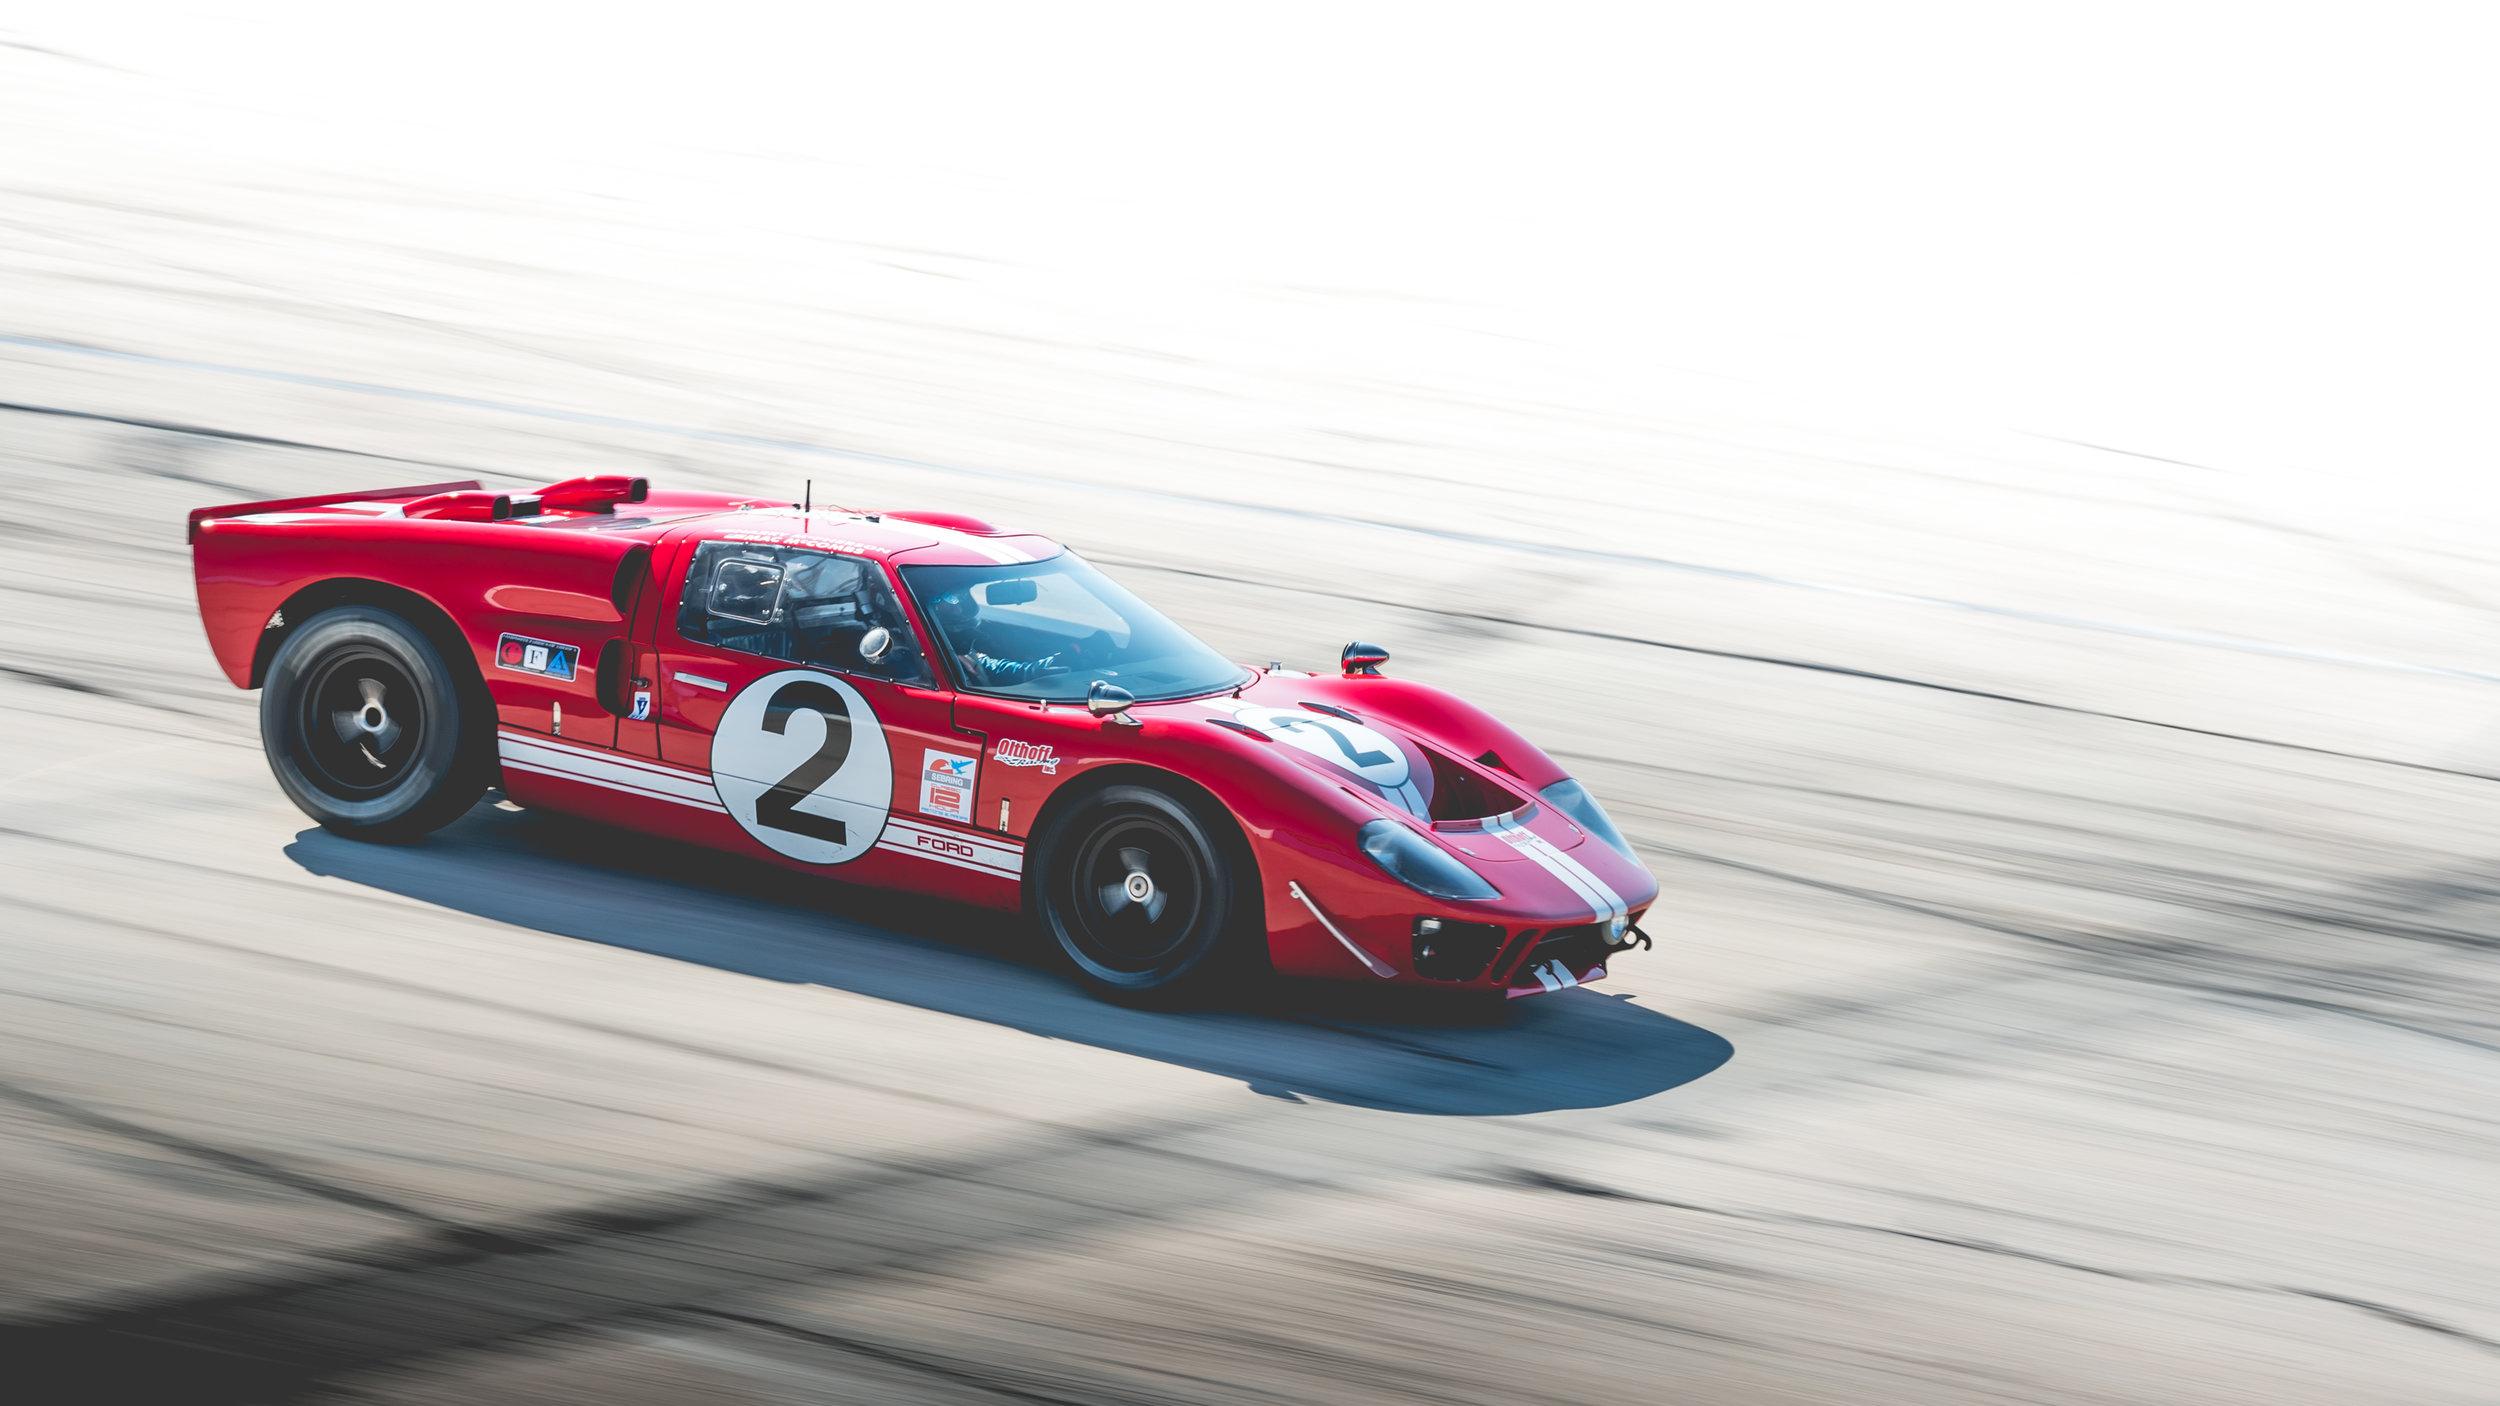 Motorsports - Photos of racing captured around the world.